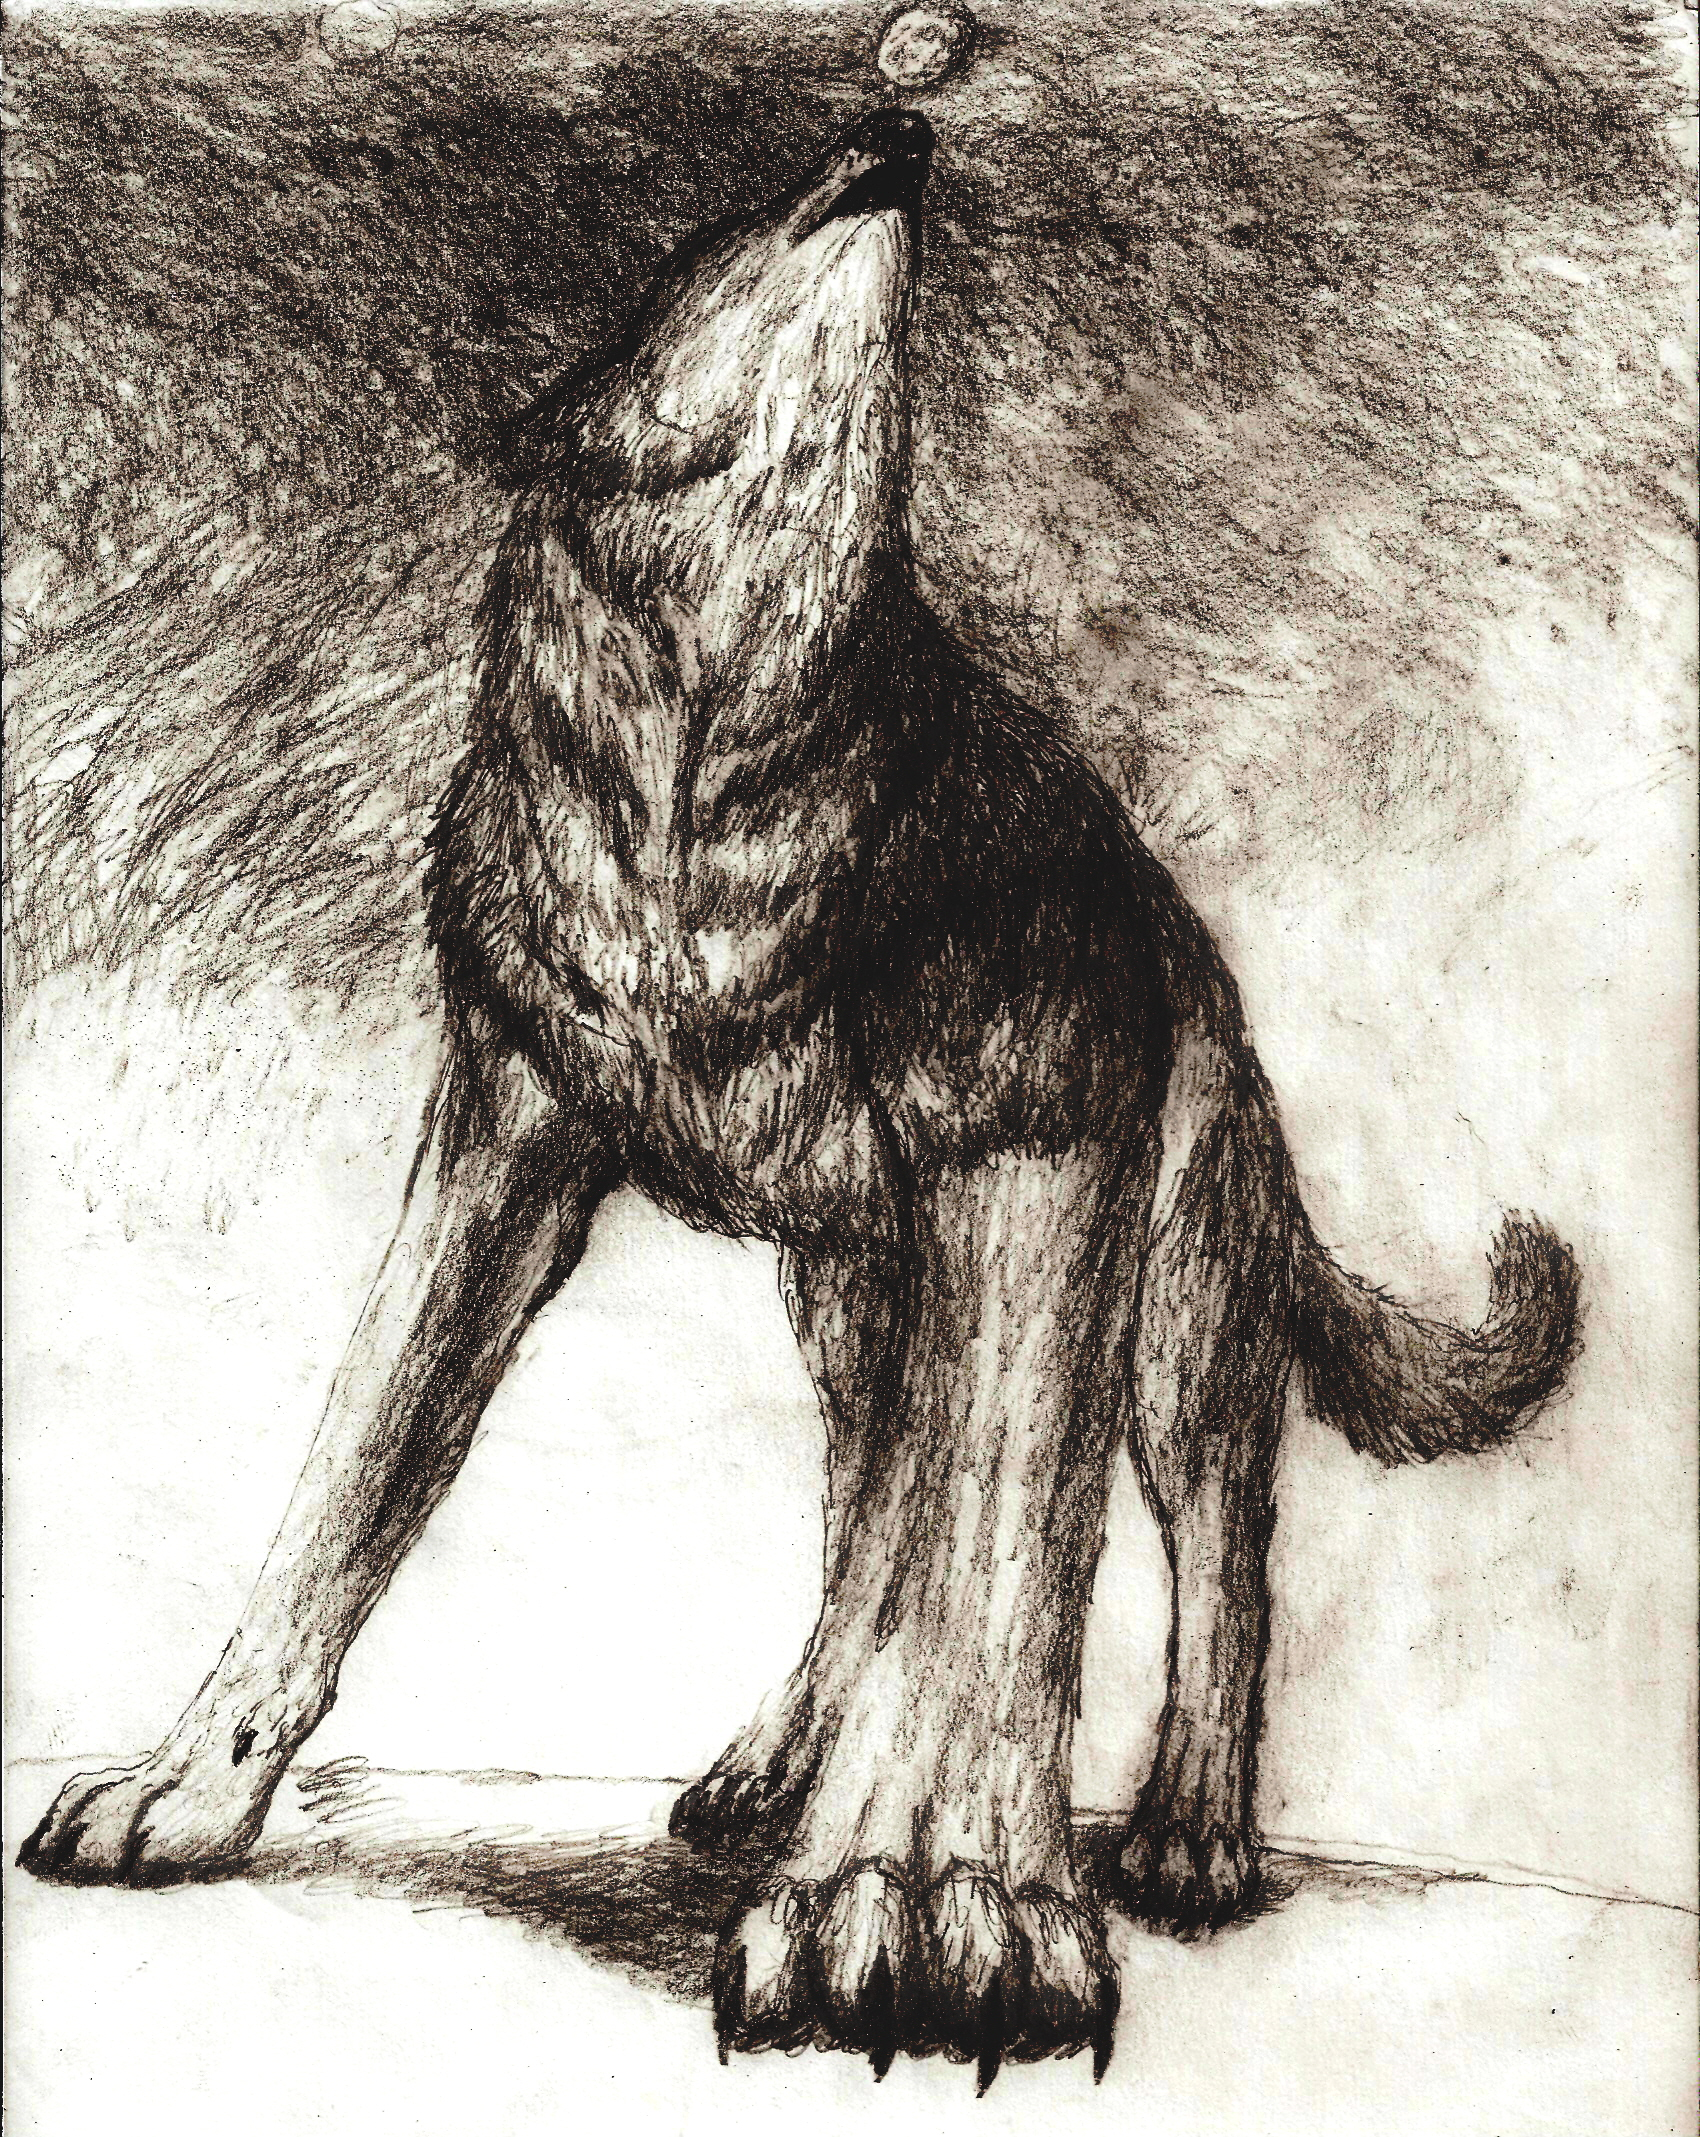 http://fc07.deviantart.net/fs36/f/2008/280/b/7/dark_wolf_howling_to_black_sky_by_Rhahsid.jpg